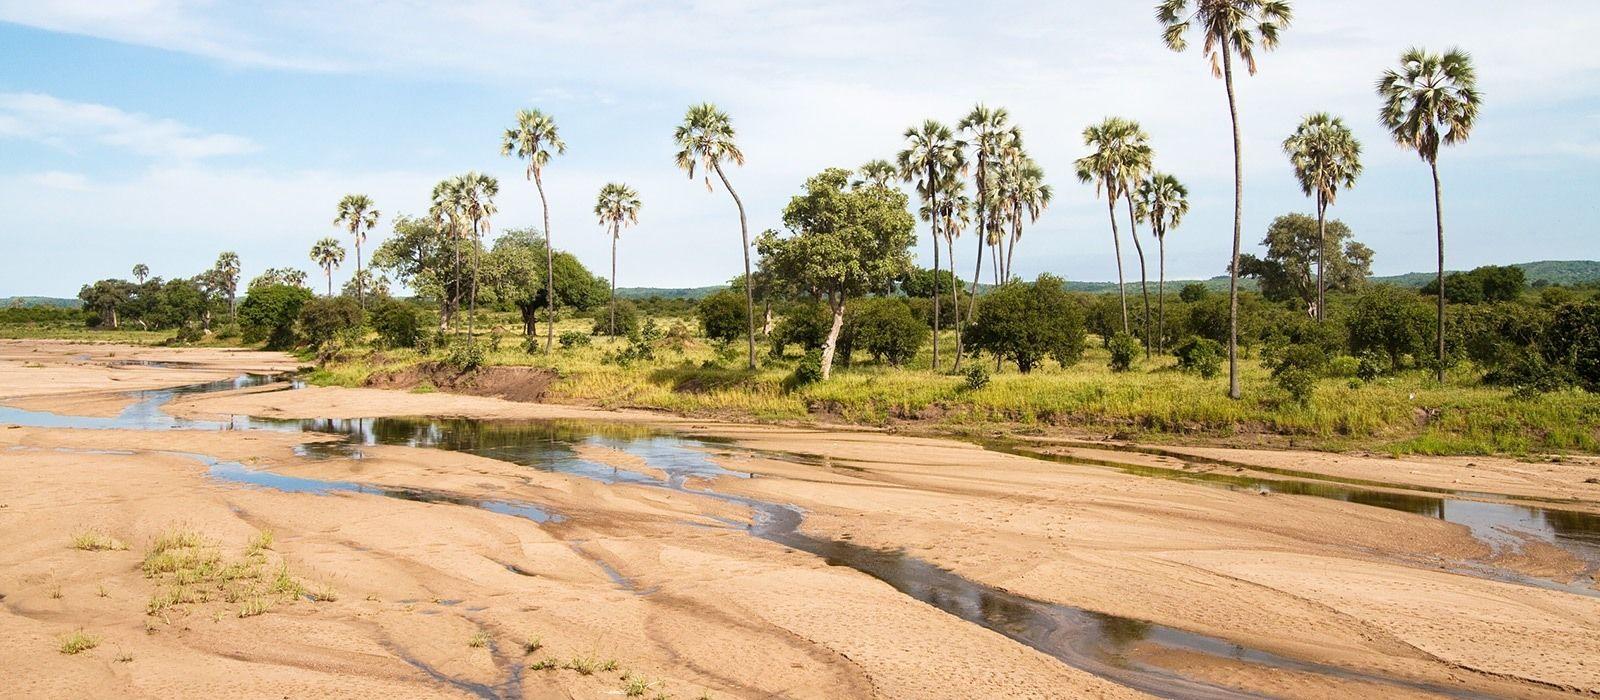 Authentic Tanzania: Wildlife and Pristine Beach Tour Trip 2